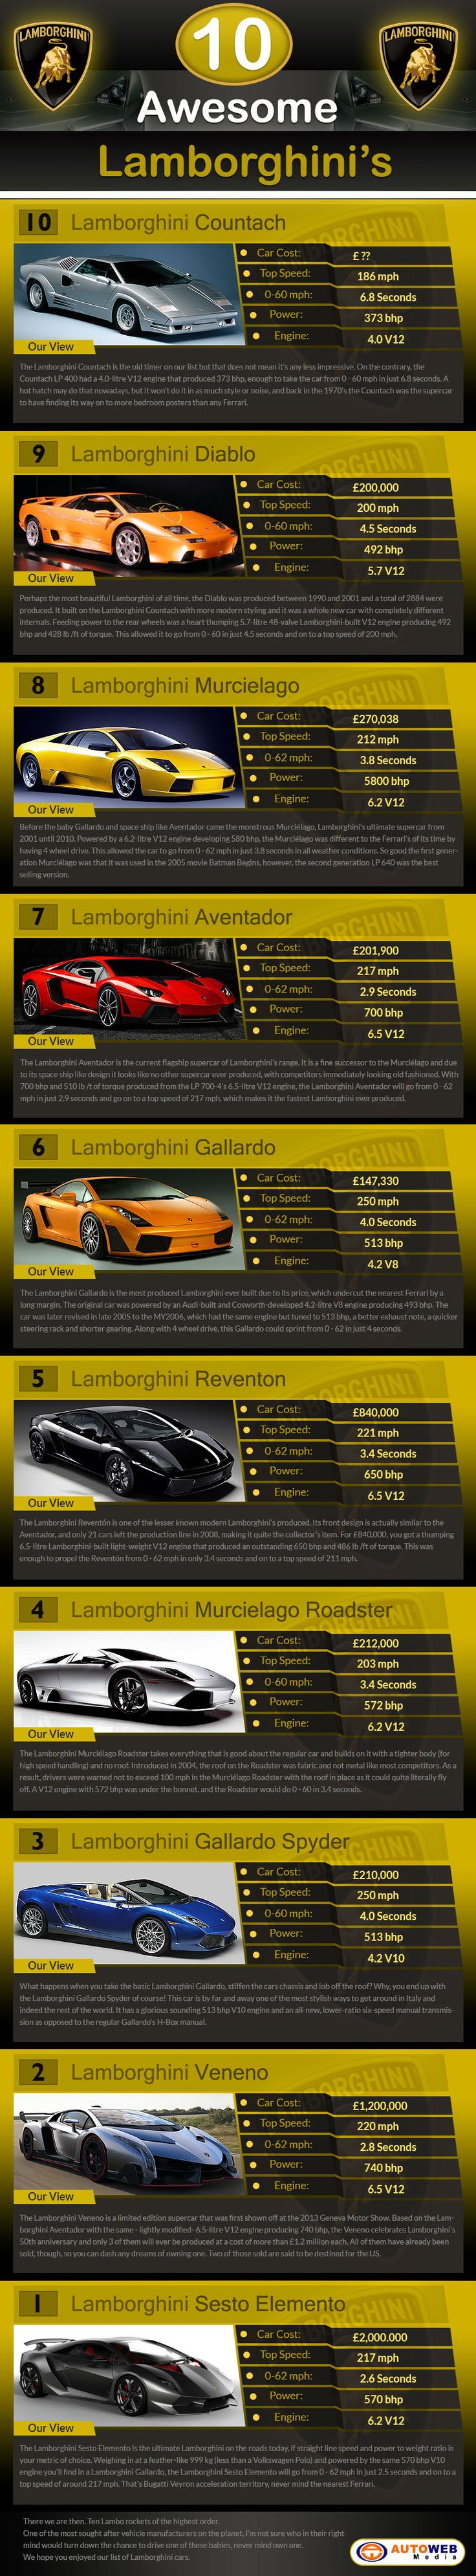 10 Lamborghini Sports Entre para o Grupo: https://www.facebook.com/groups/kartracingviral #kartracingviral